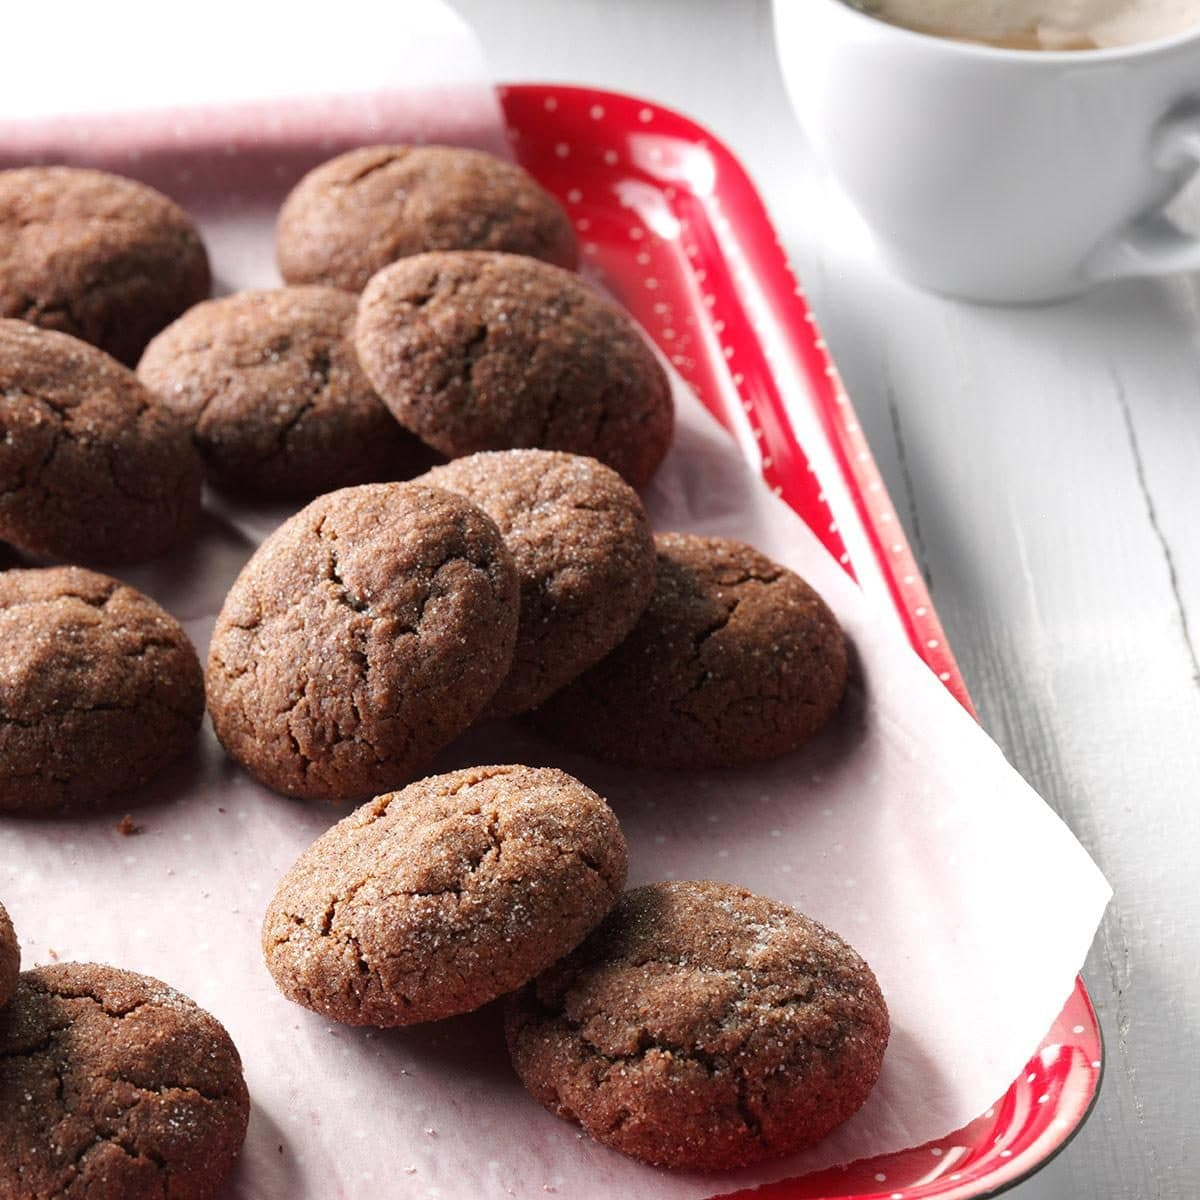 ORANGE CHILI CHOCOLATE COOKIES EXPS THCA17 132298 D05 26 5B GALLETAS DE CHOCOLATE CON NARANJA Y CHILE